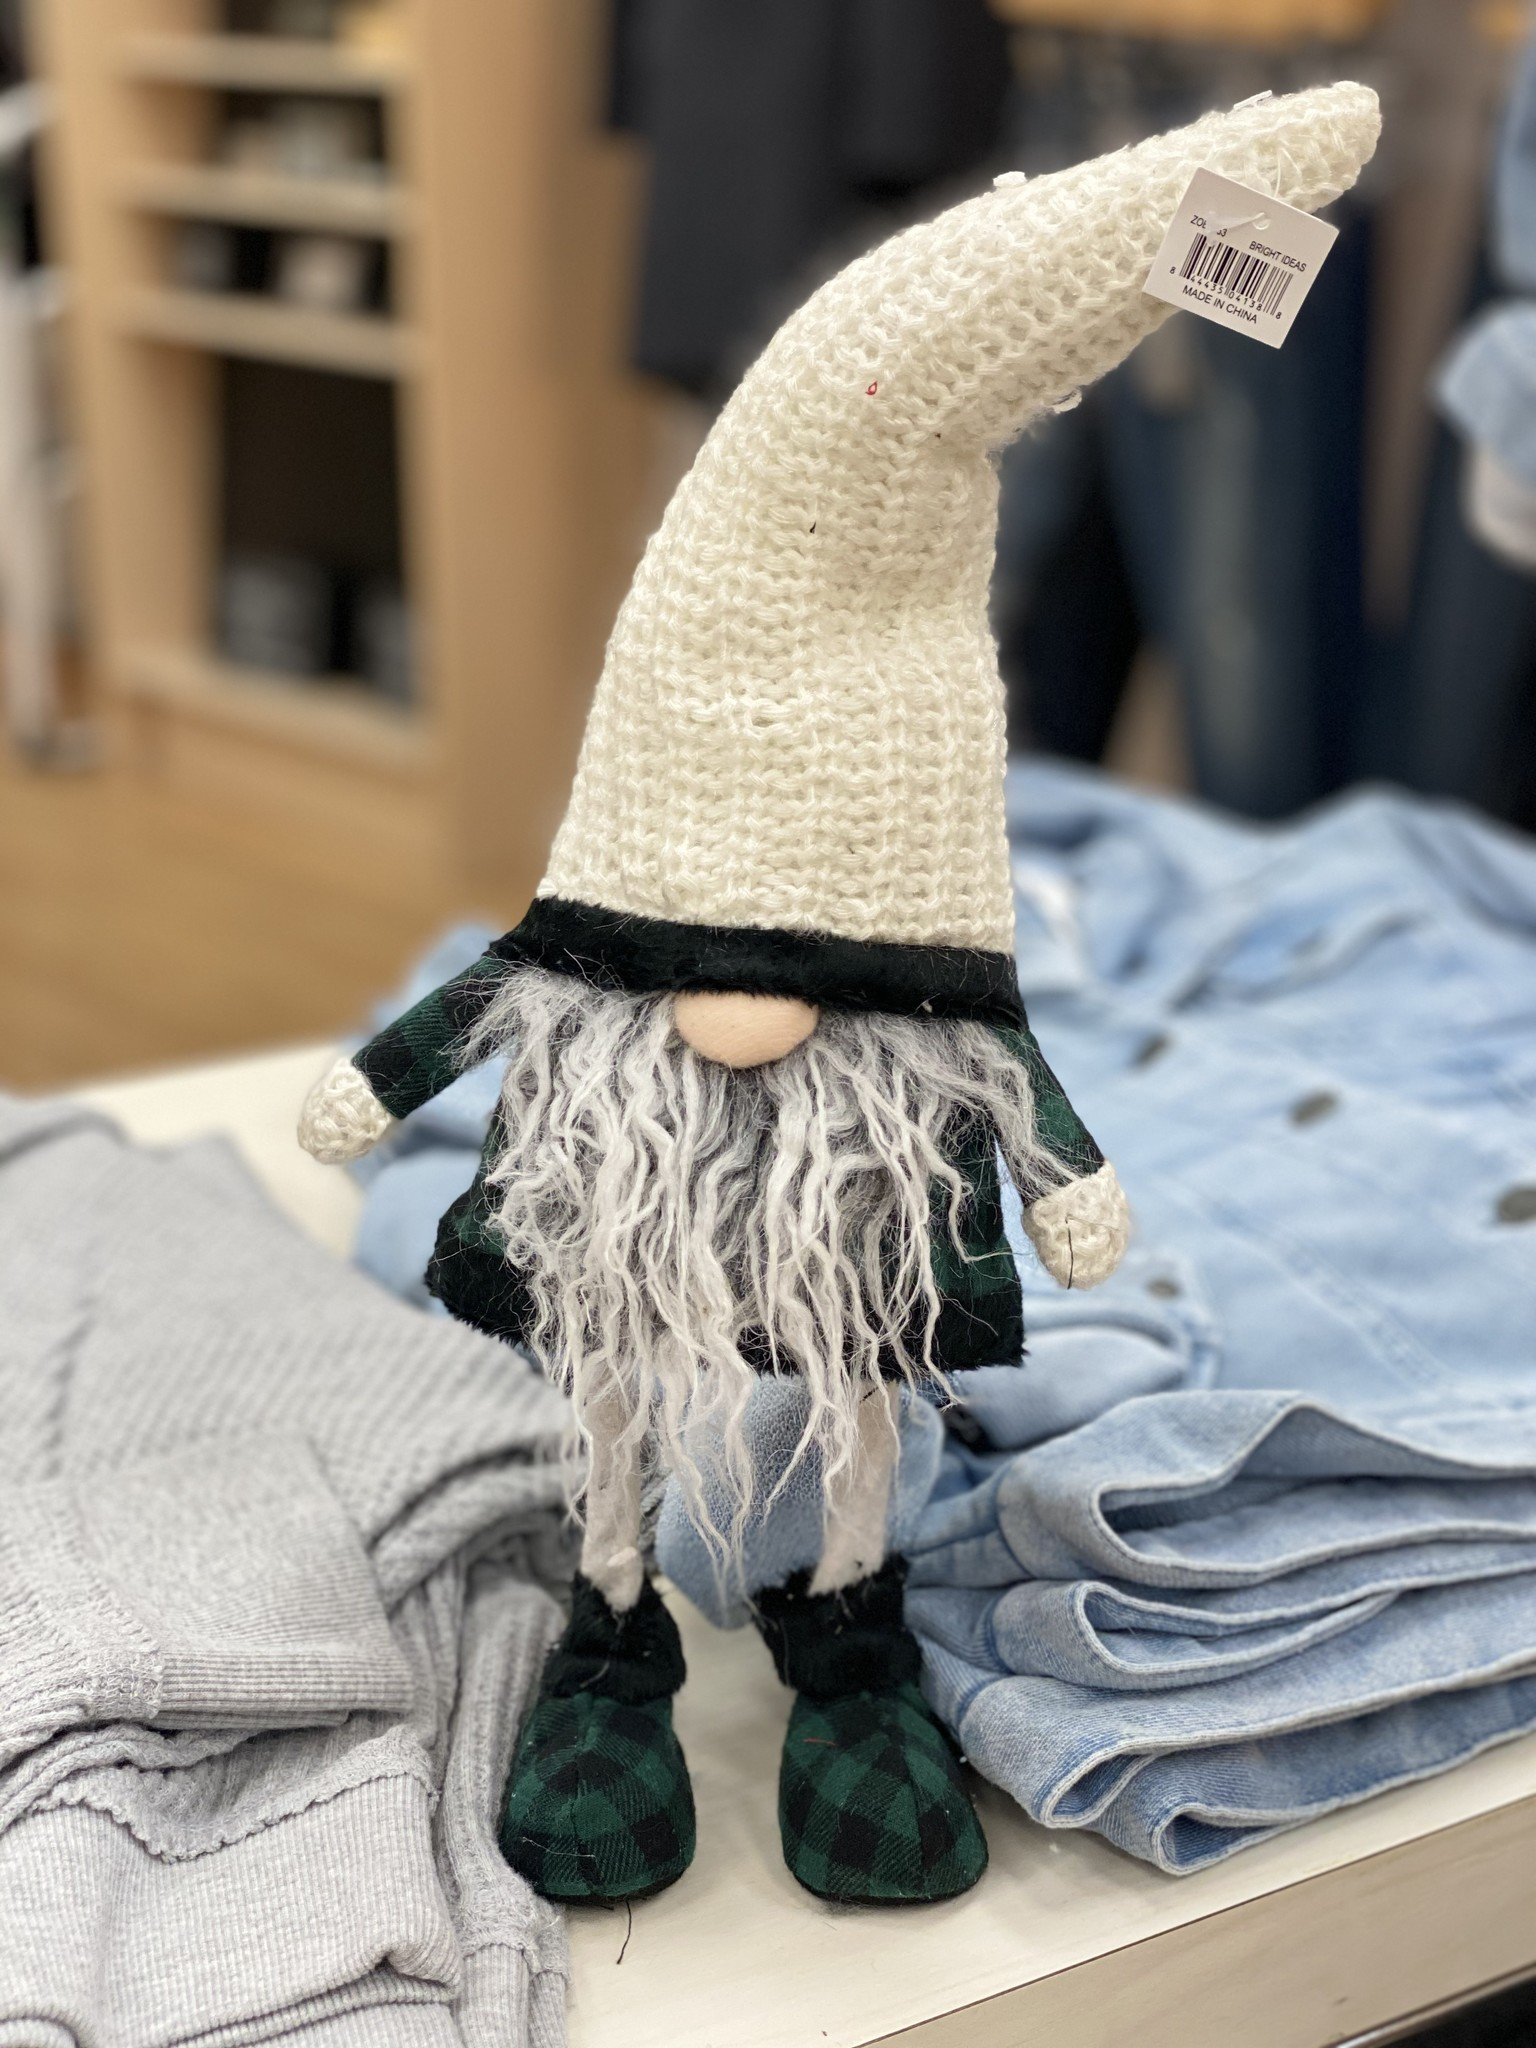 Bright Ideas Plaid Wobble Gnome 16 in - Assorted Colors